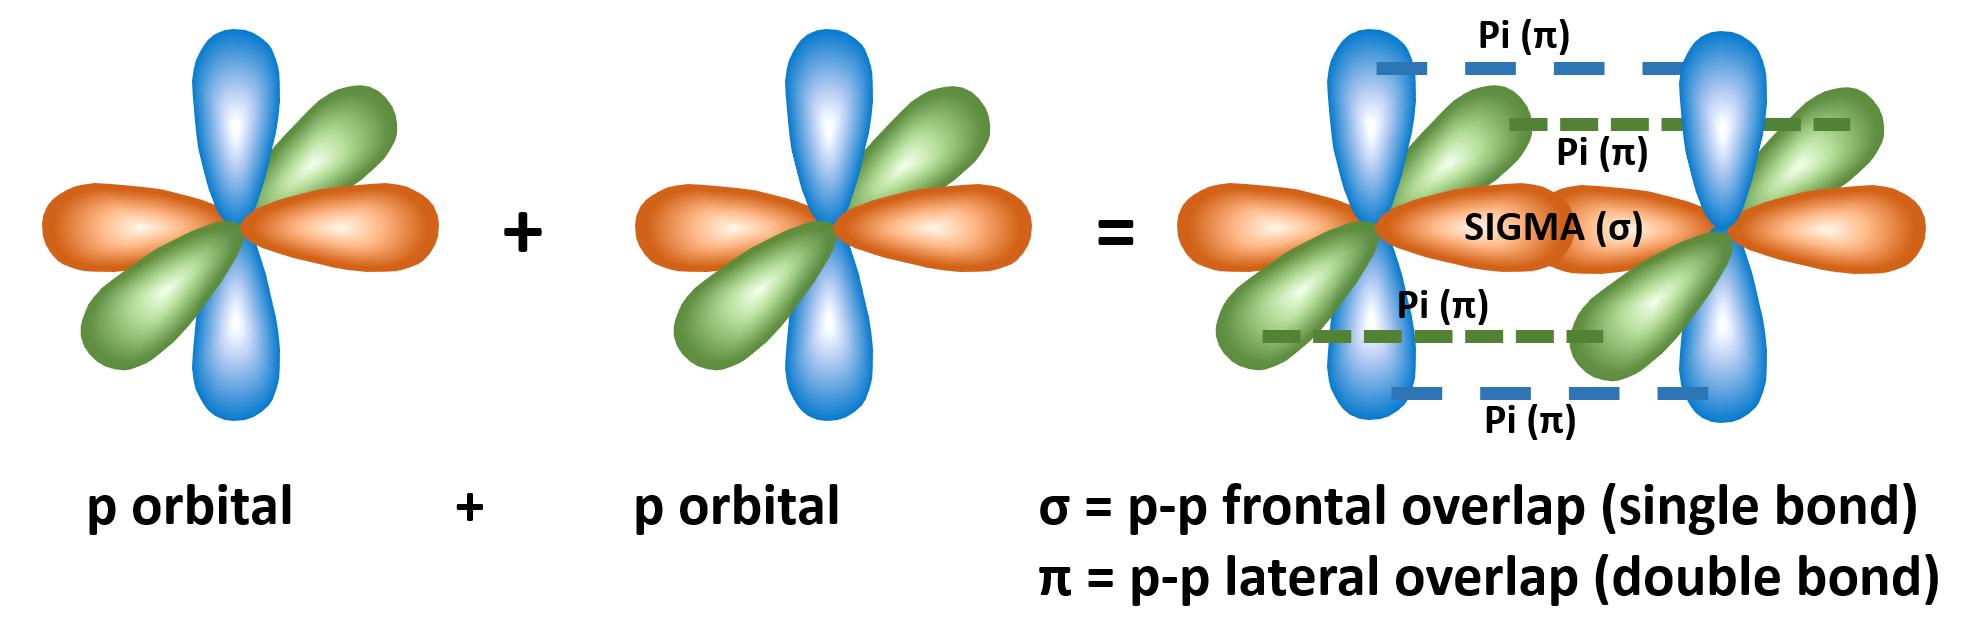 triple bond-sigma-pi bond